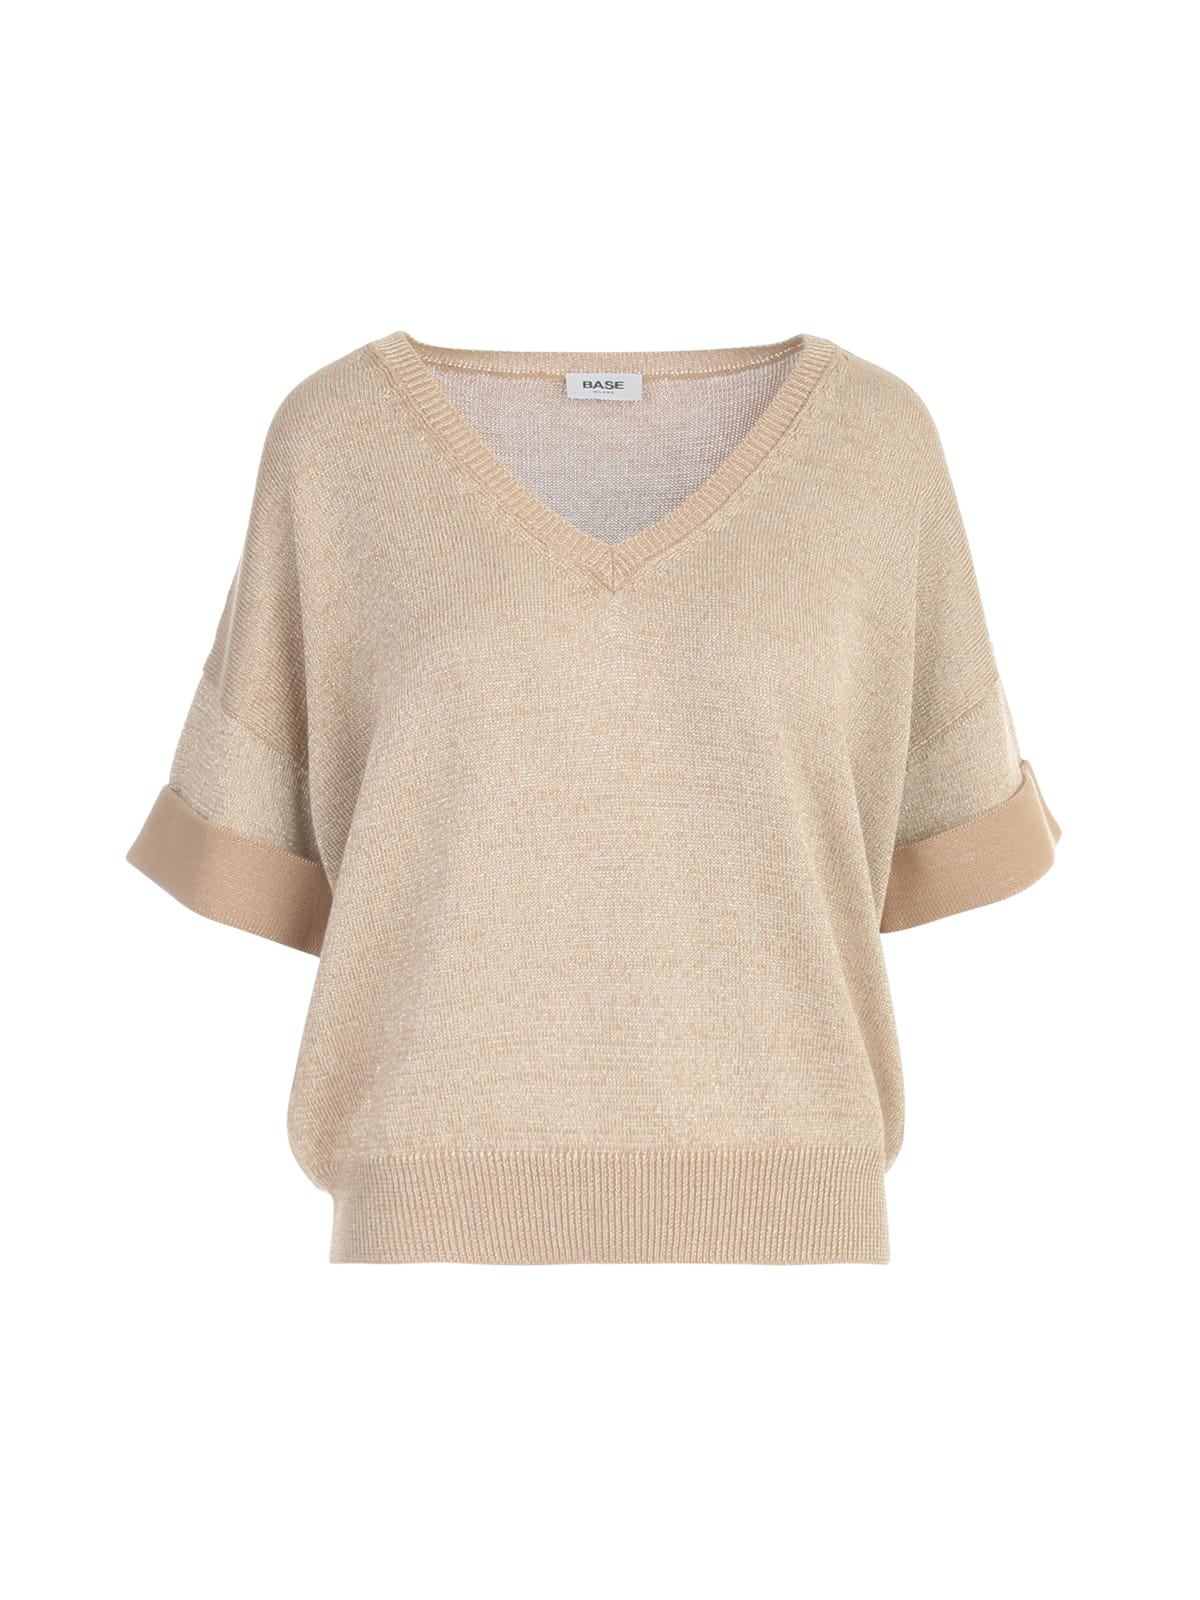 Lurex V Neck S/s Sweater